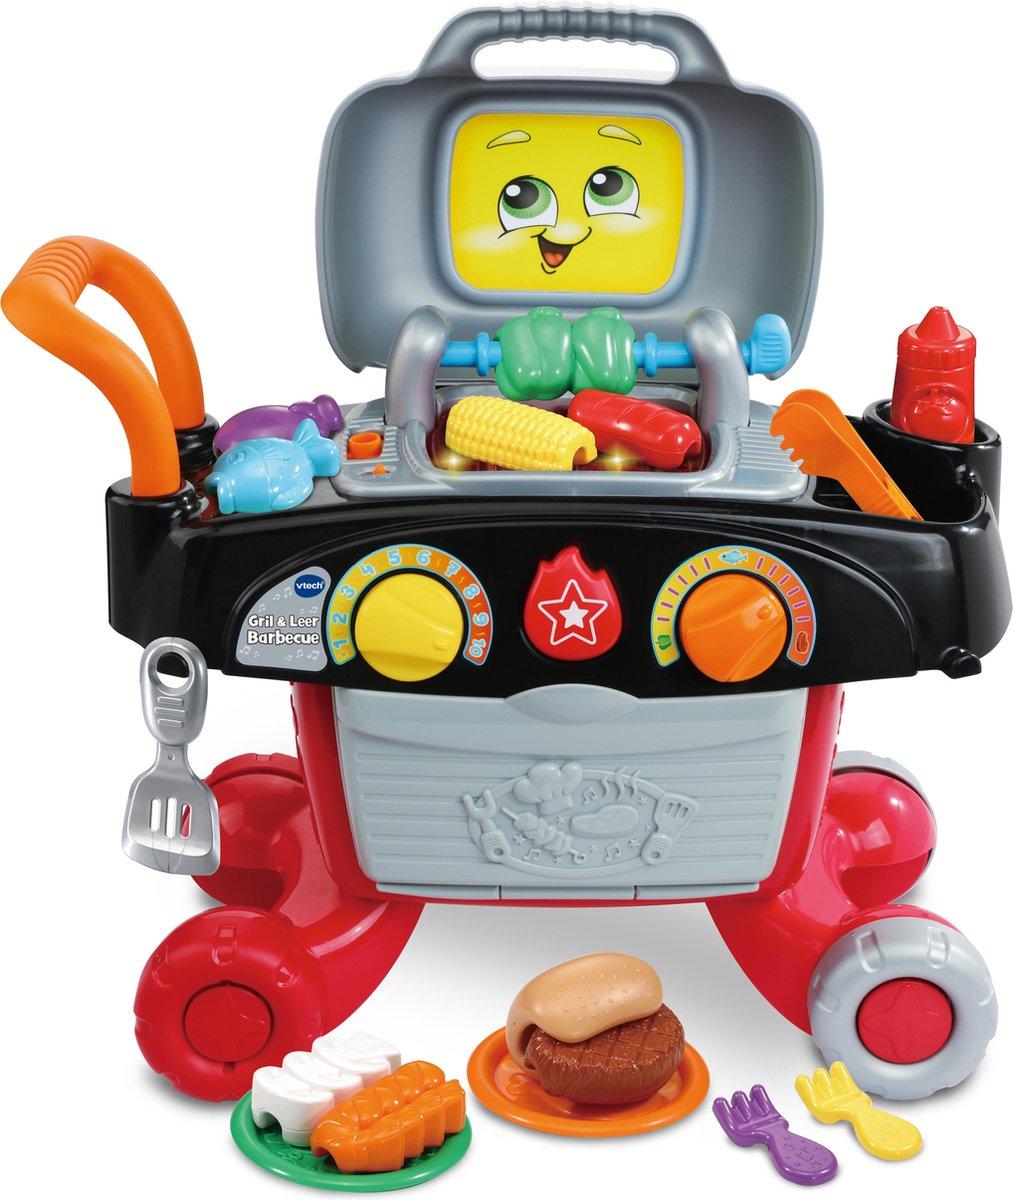 VTech Preschool Gril & Leer Barbecue Speelgoed BBQ BBQ.nl